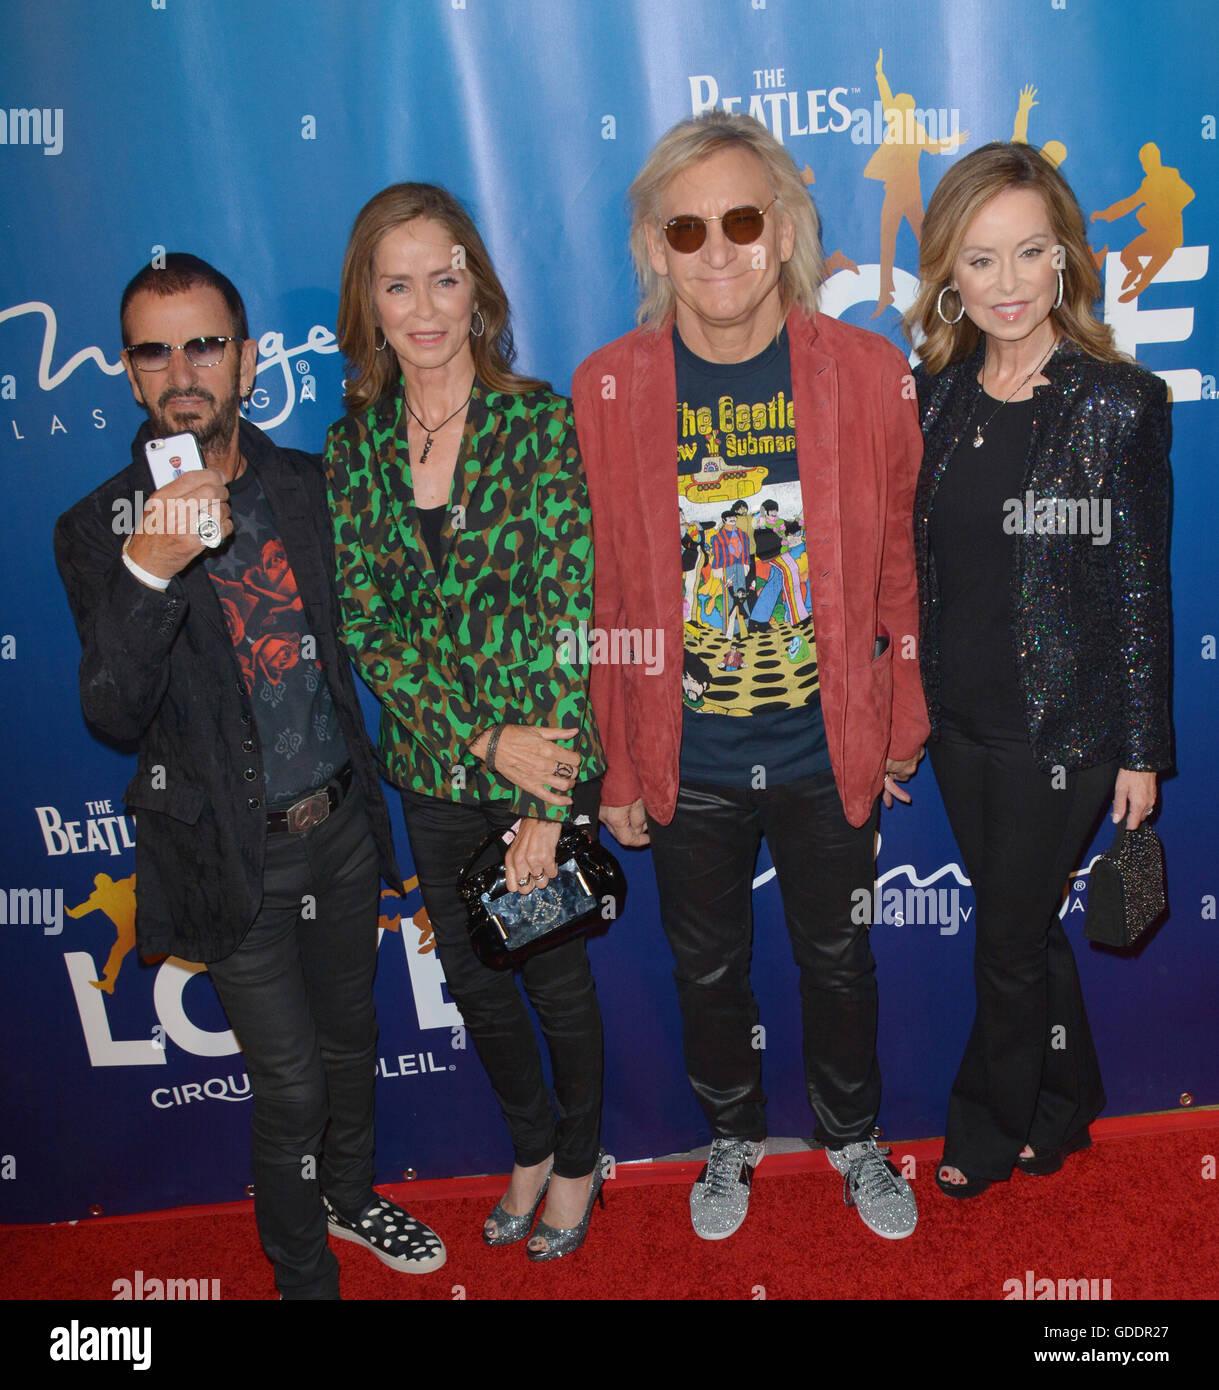 Las Vegas, Nevada, USA. 14th July, 2016. Musician Ringo ...